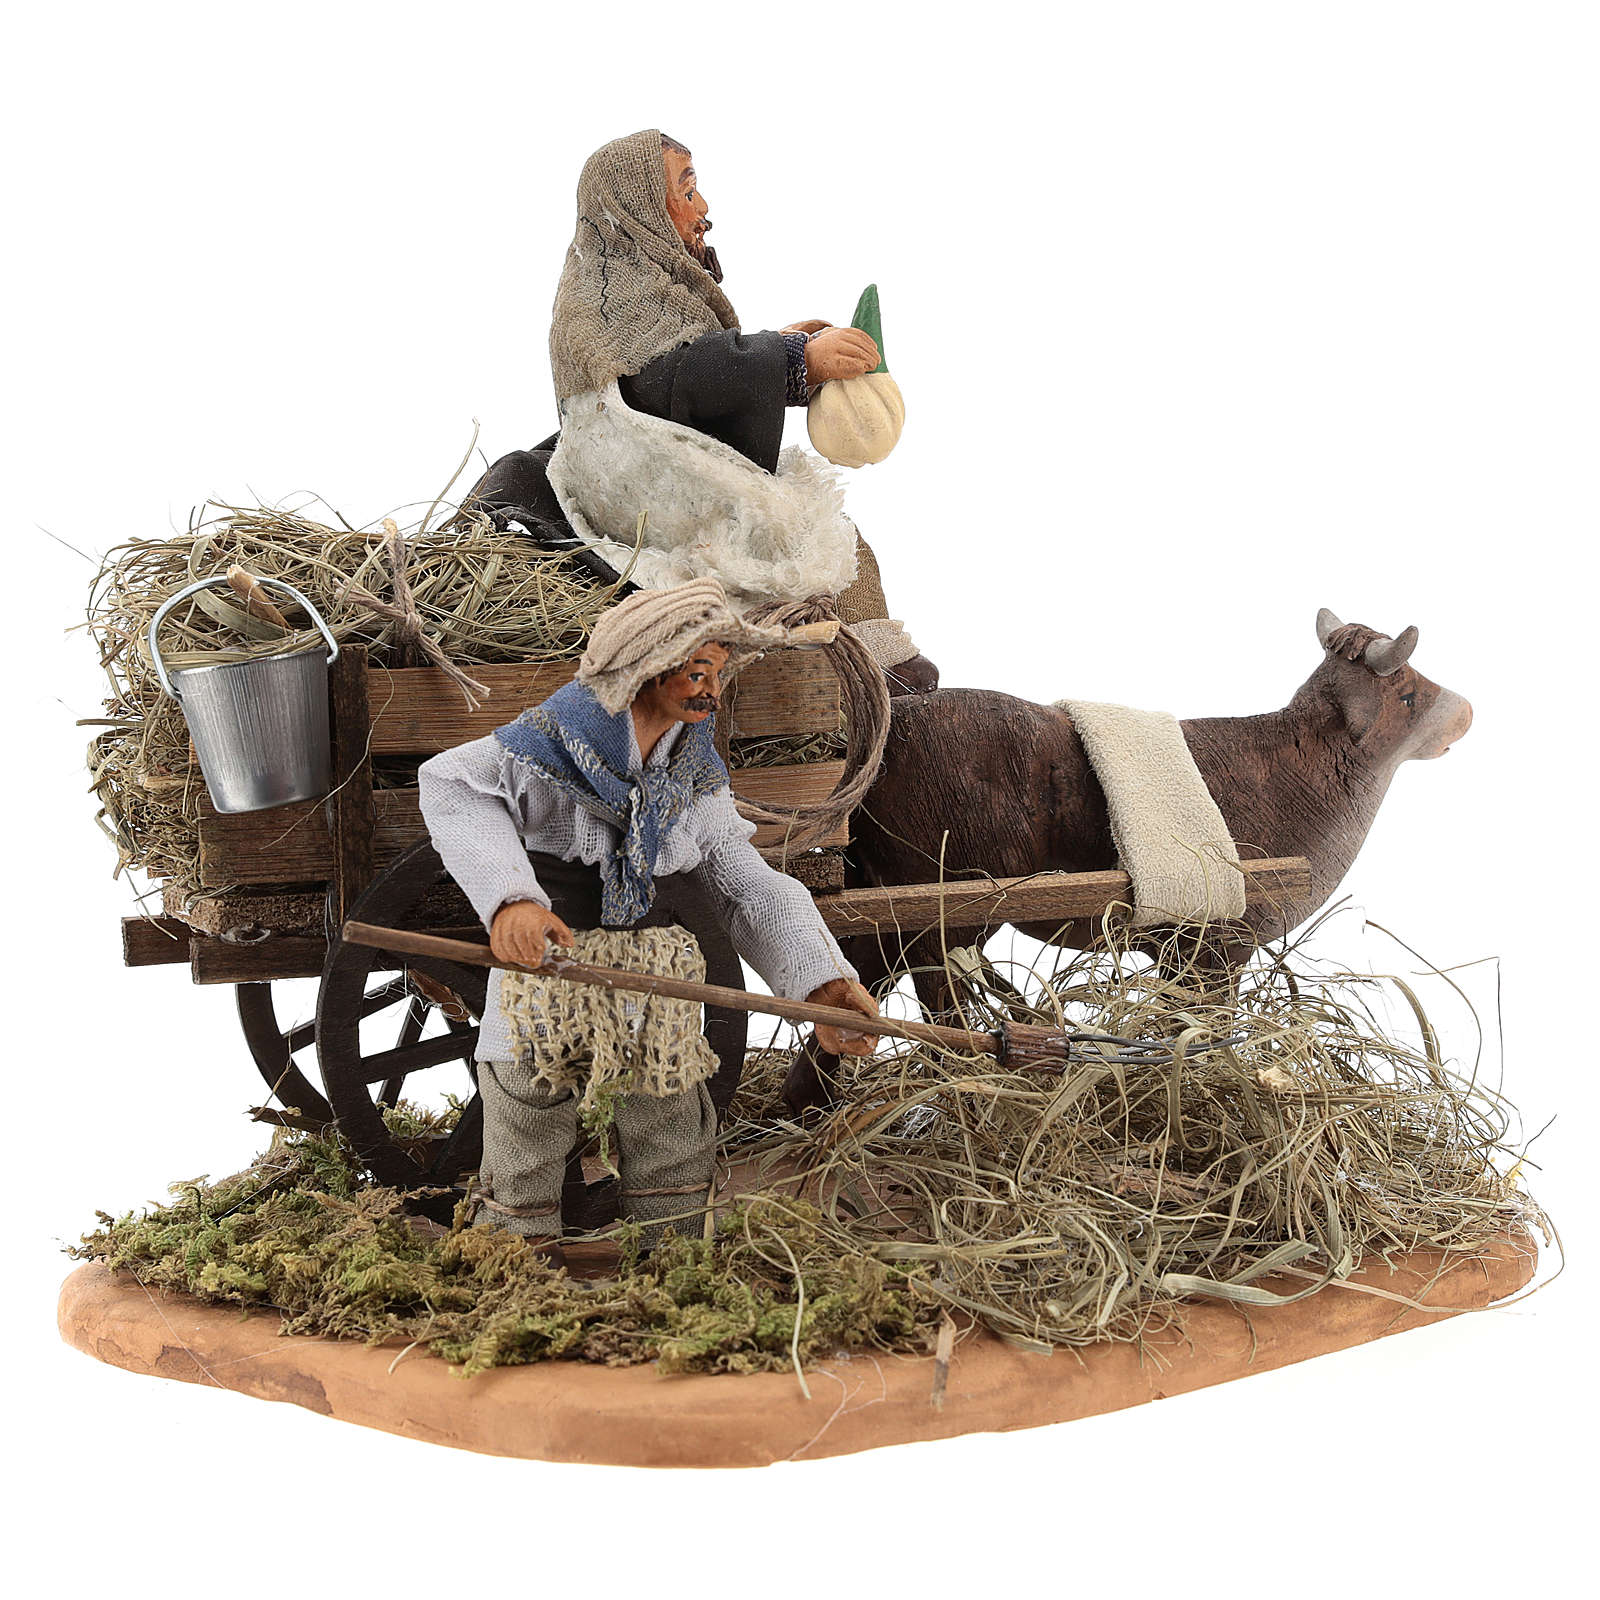 Nativity set accessory Country scene cart 10 cm clay figurines 4